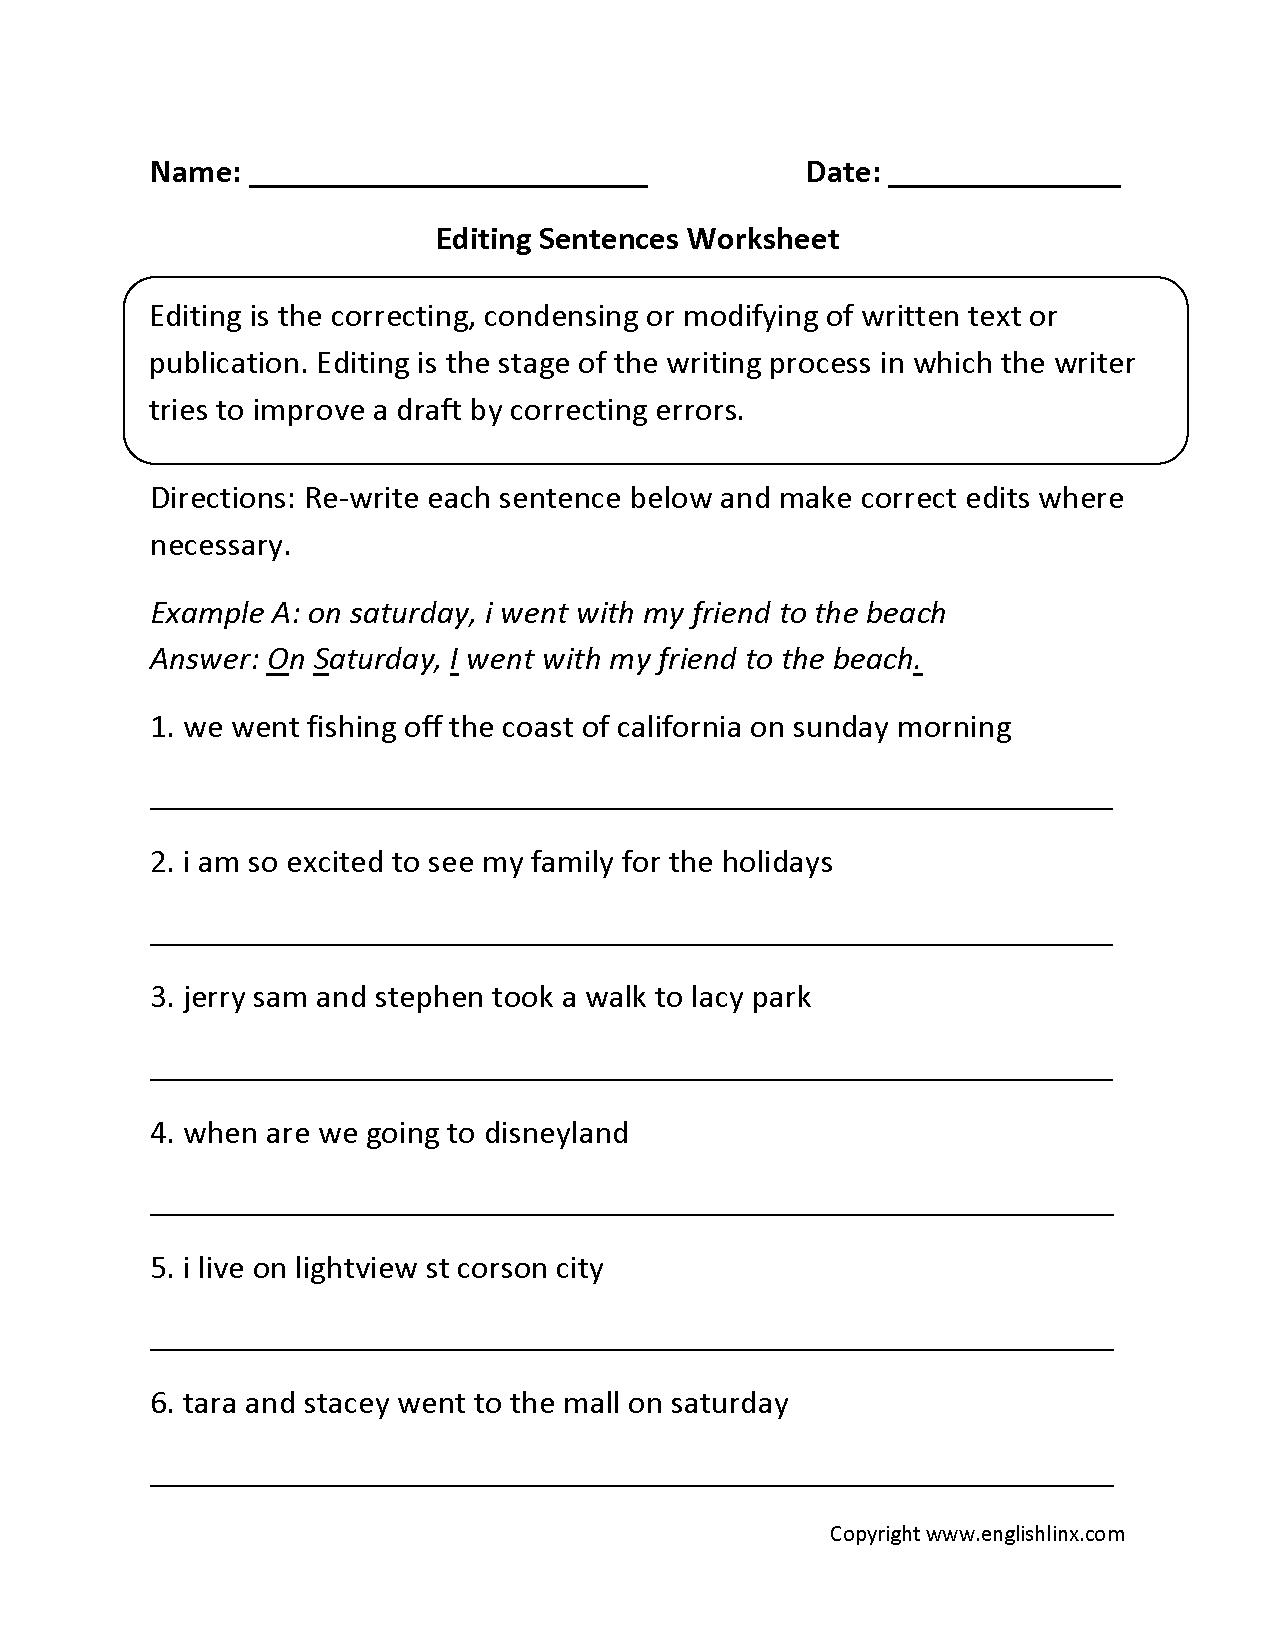 Writing Worksheets  Editing Worksheets Regarding Copy Editing Practice Worksheets